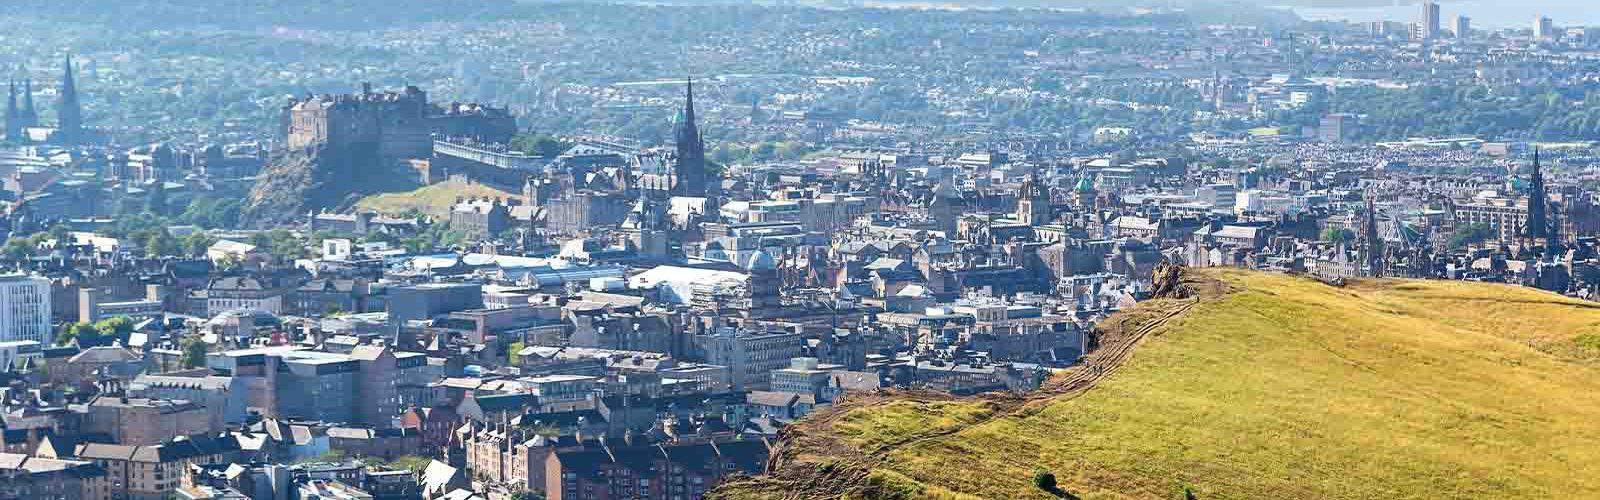 Edinburgh and Salisbury Crags form the air